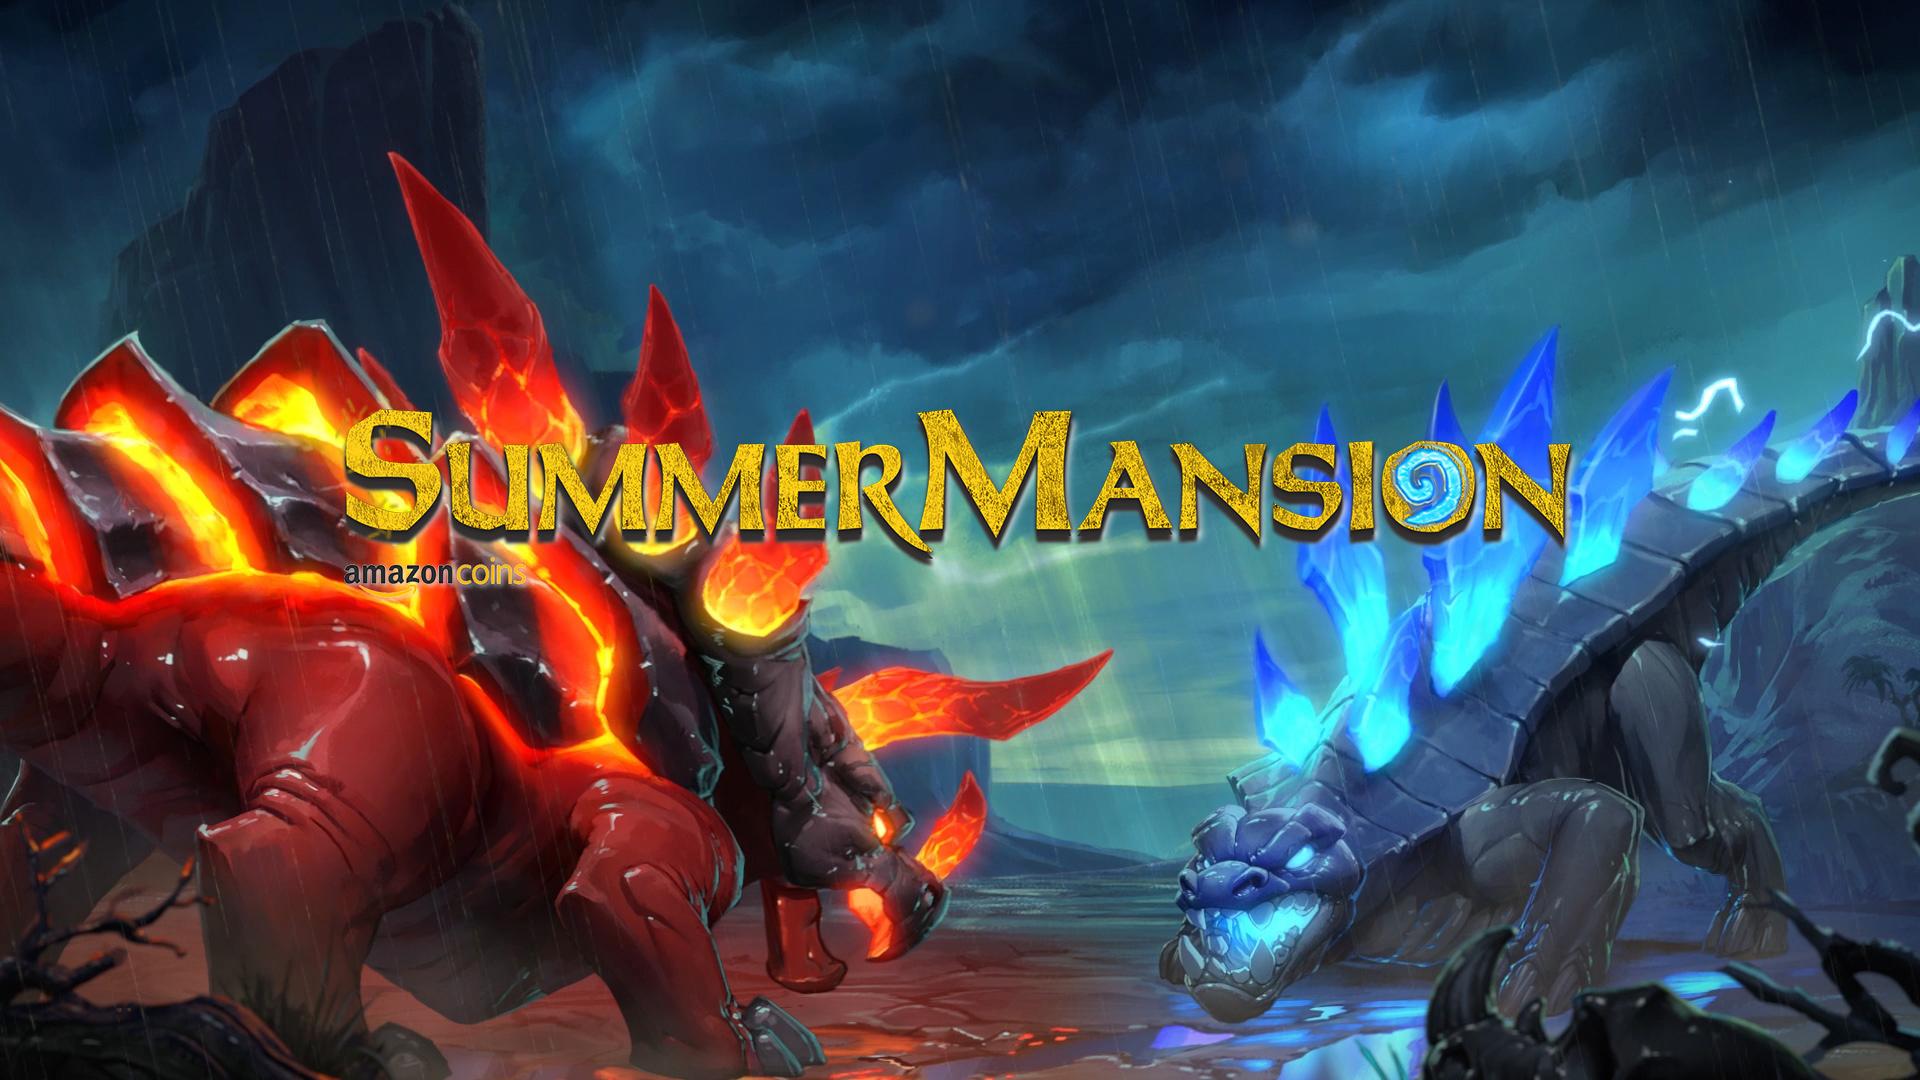 SummerMansion